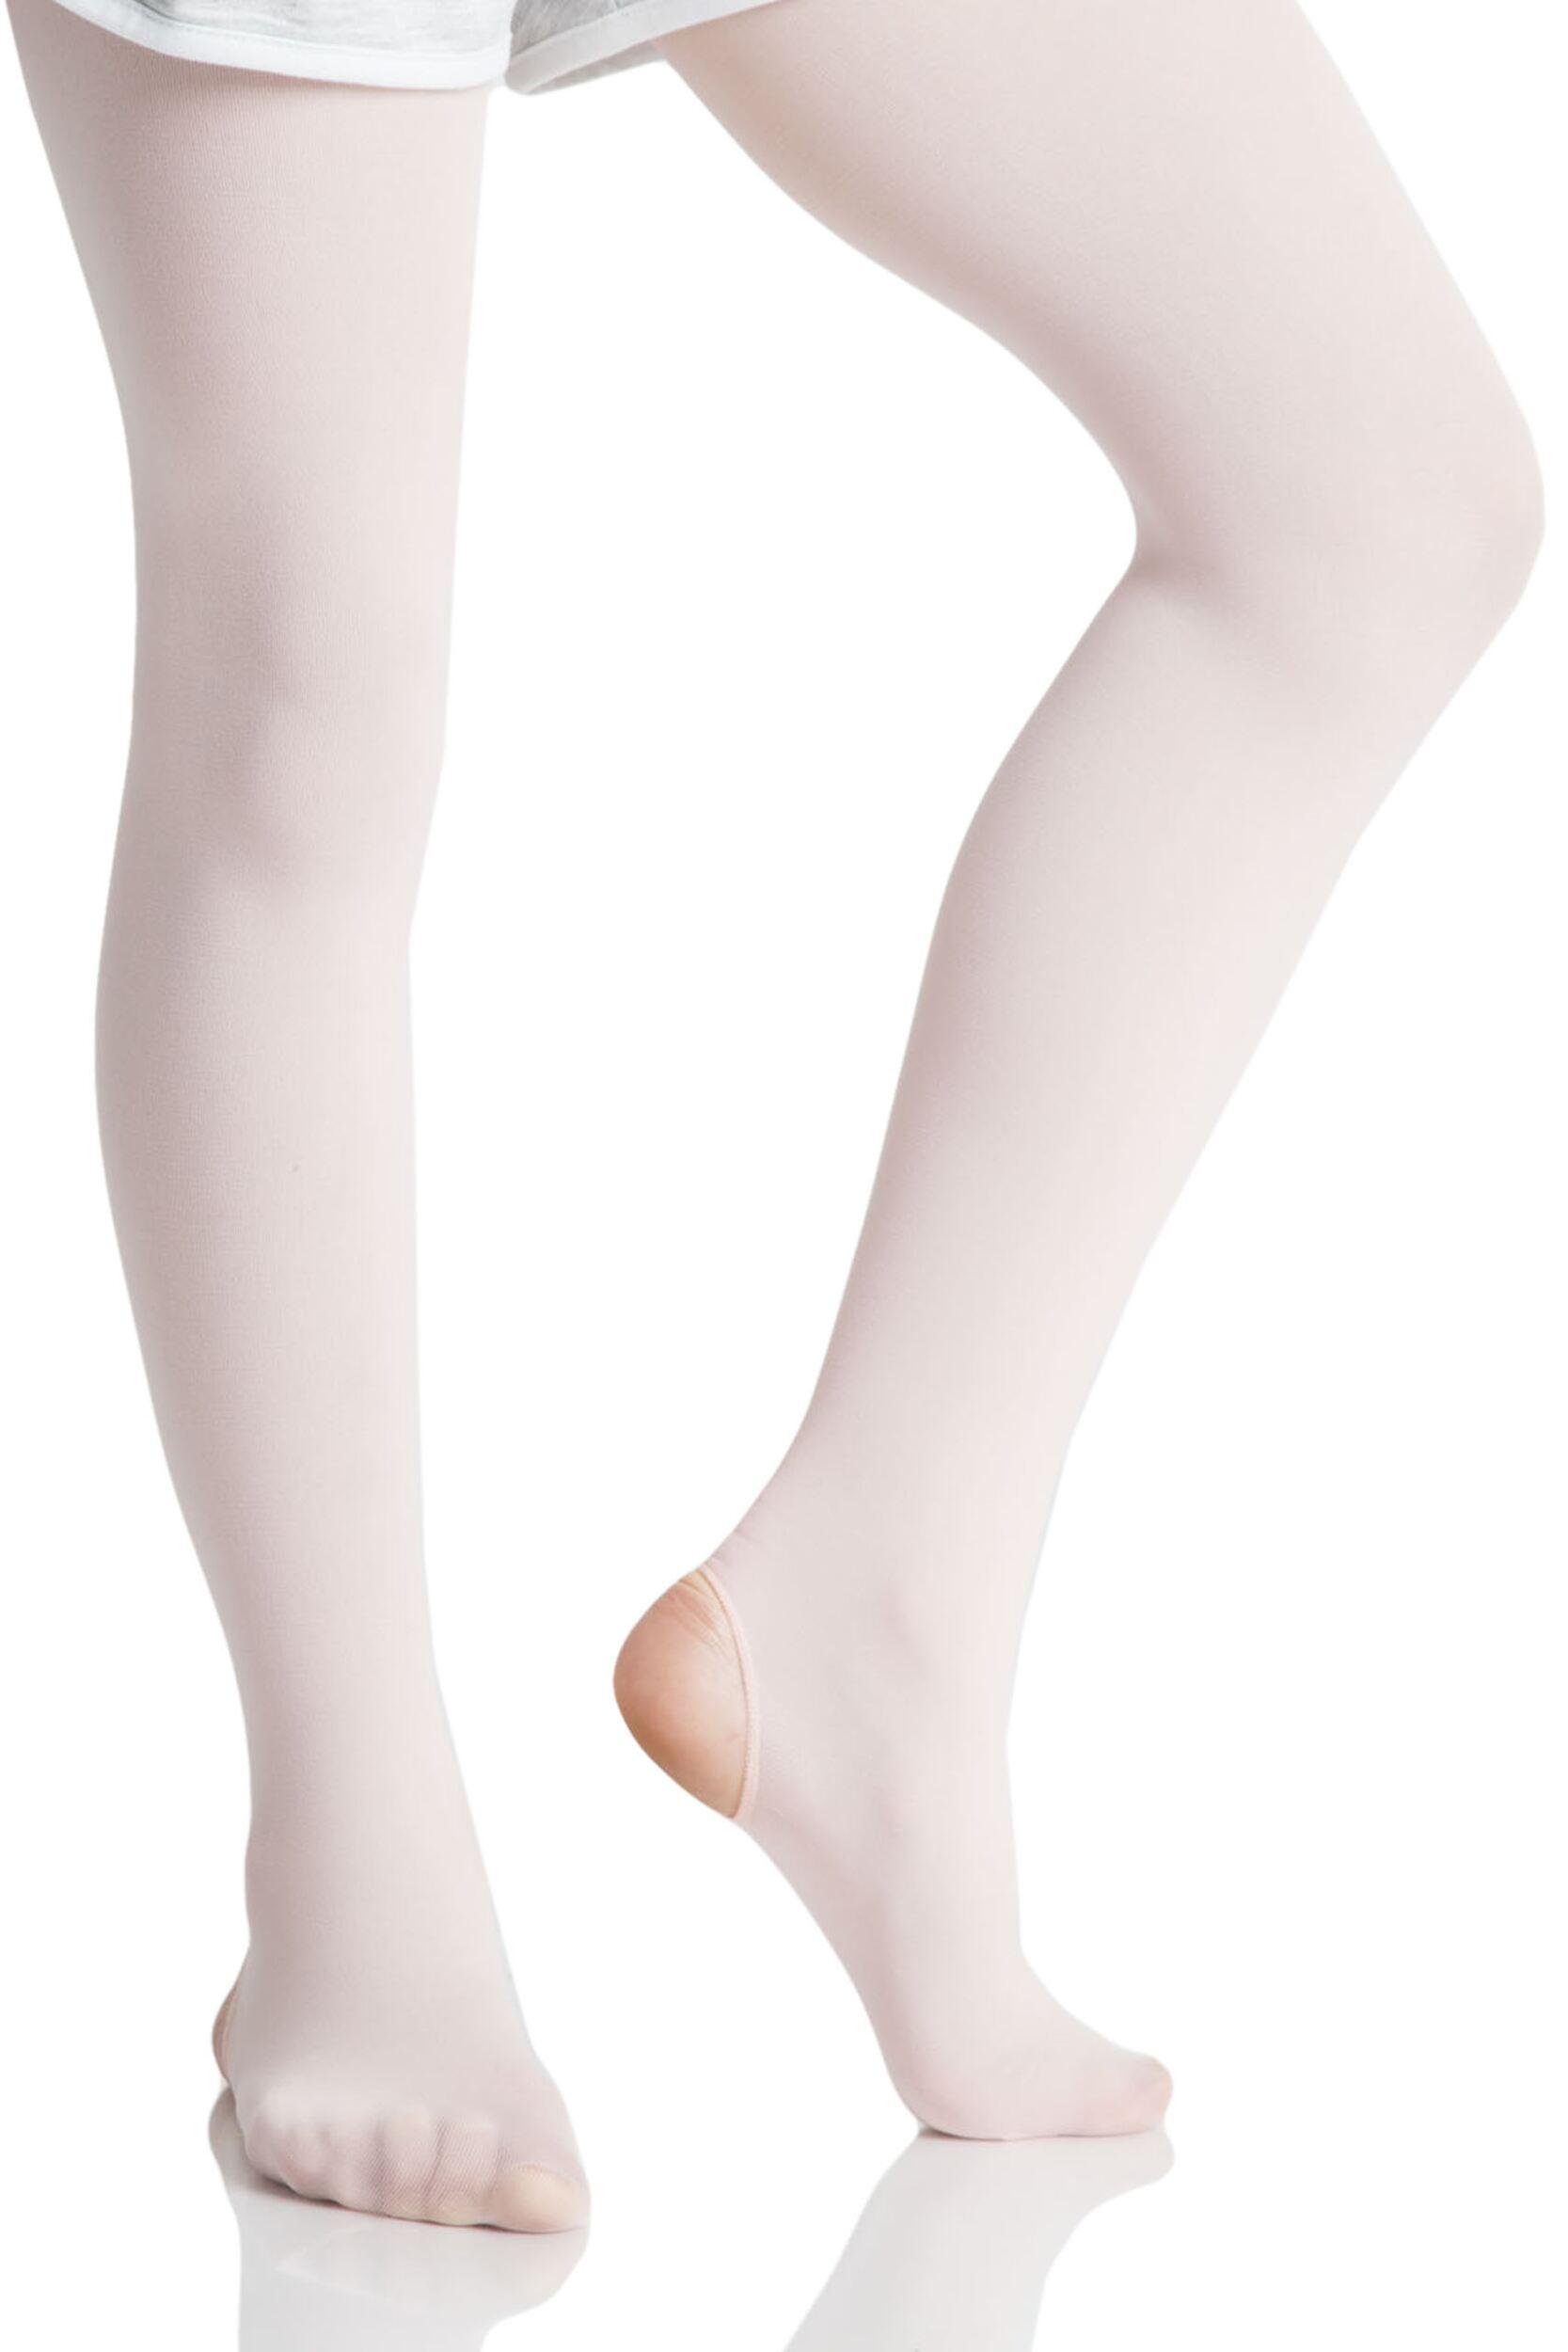 Girls 1 Pair Silky Ballet Convertible Tights